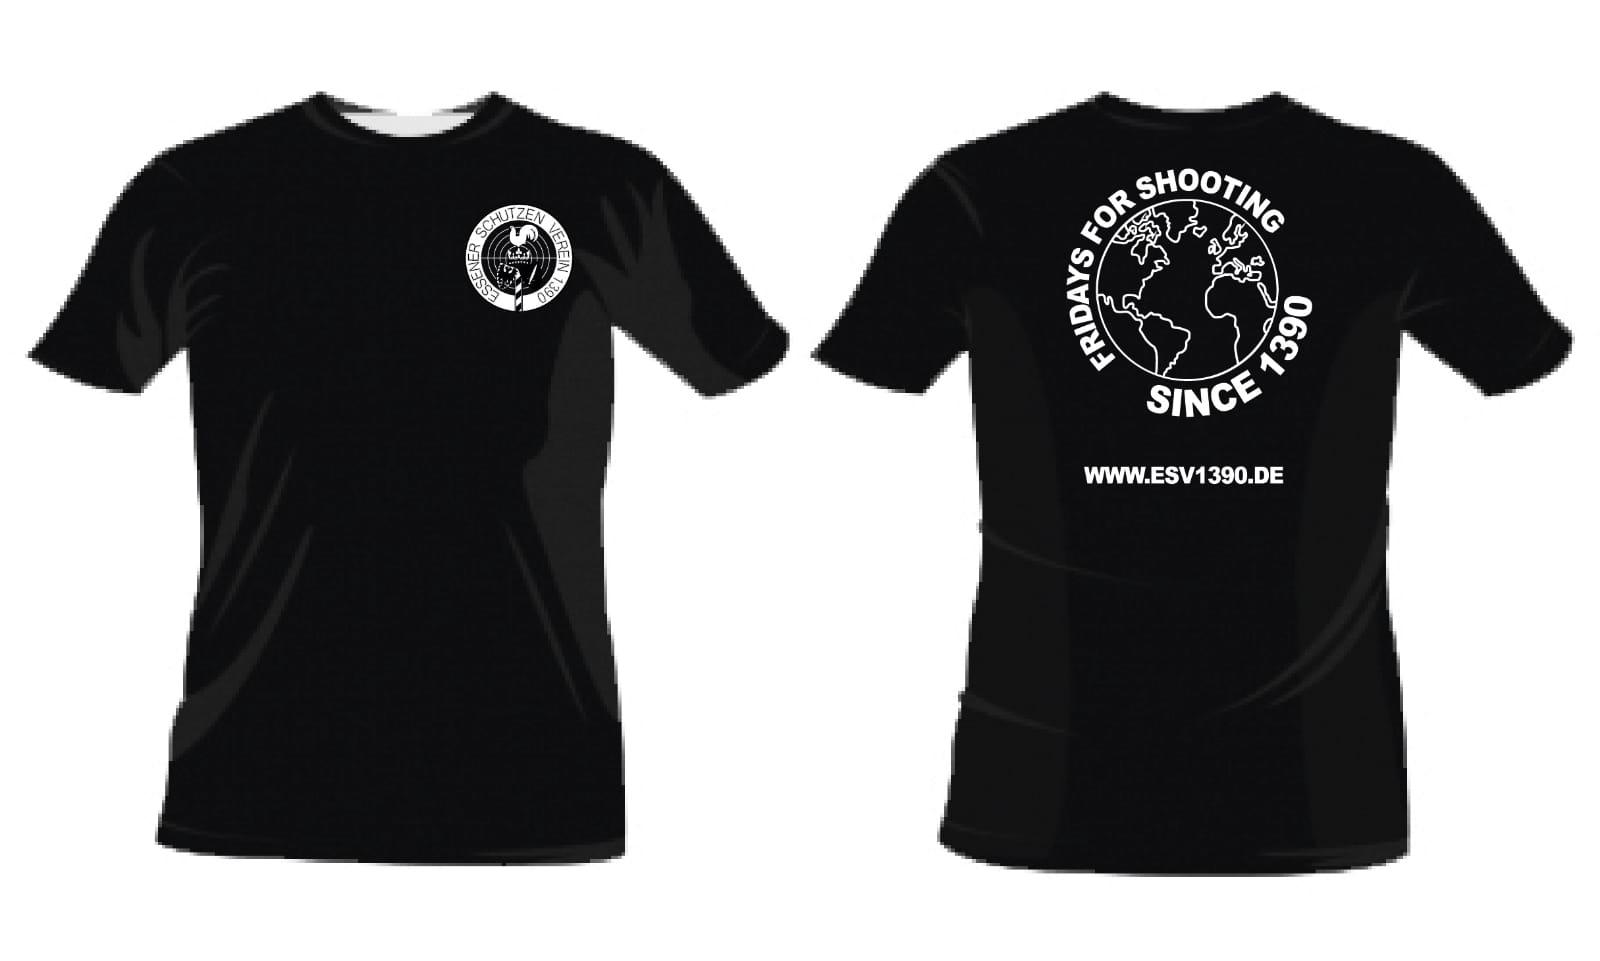 Vereinsinfos Foto T-Shirt ESV1390